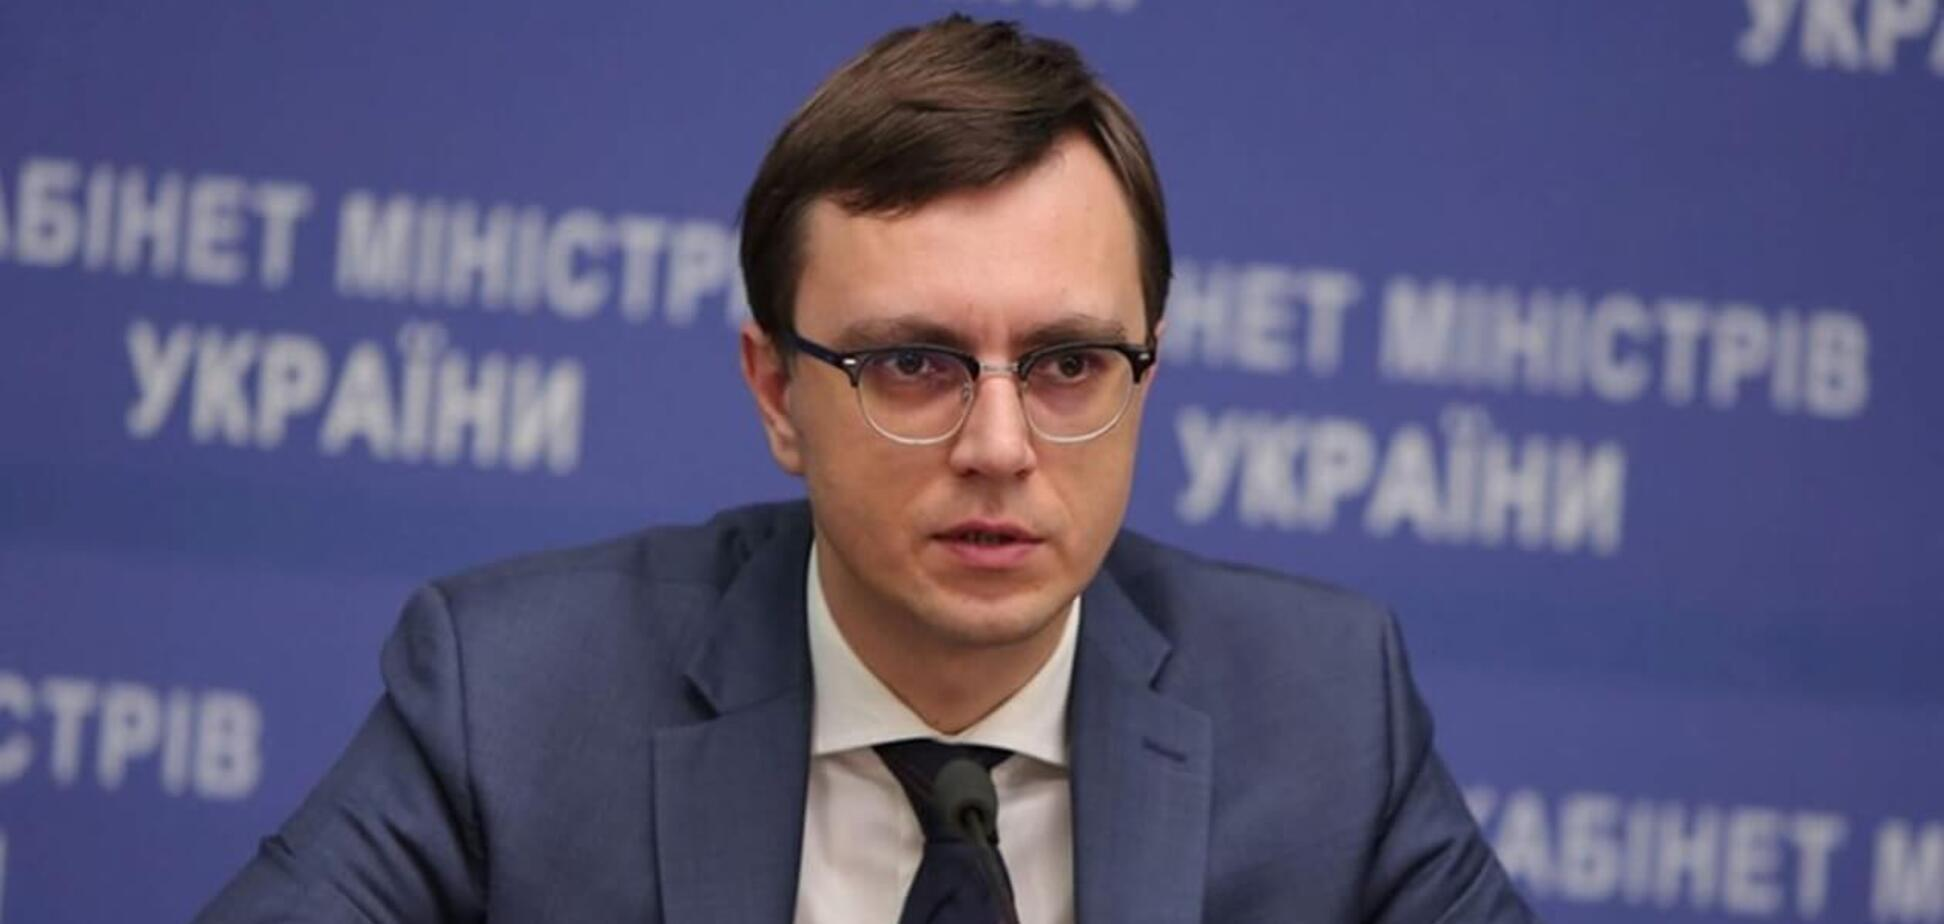 Владимир Омелян призвал Сергея Лещенко обнародовать факты коррупции на 'Укрзалізниці'